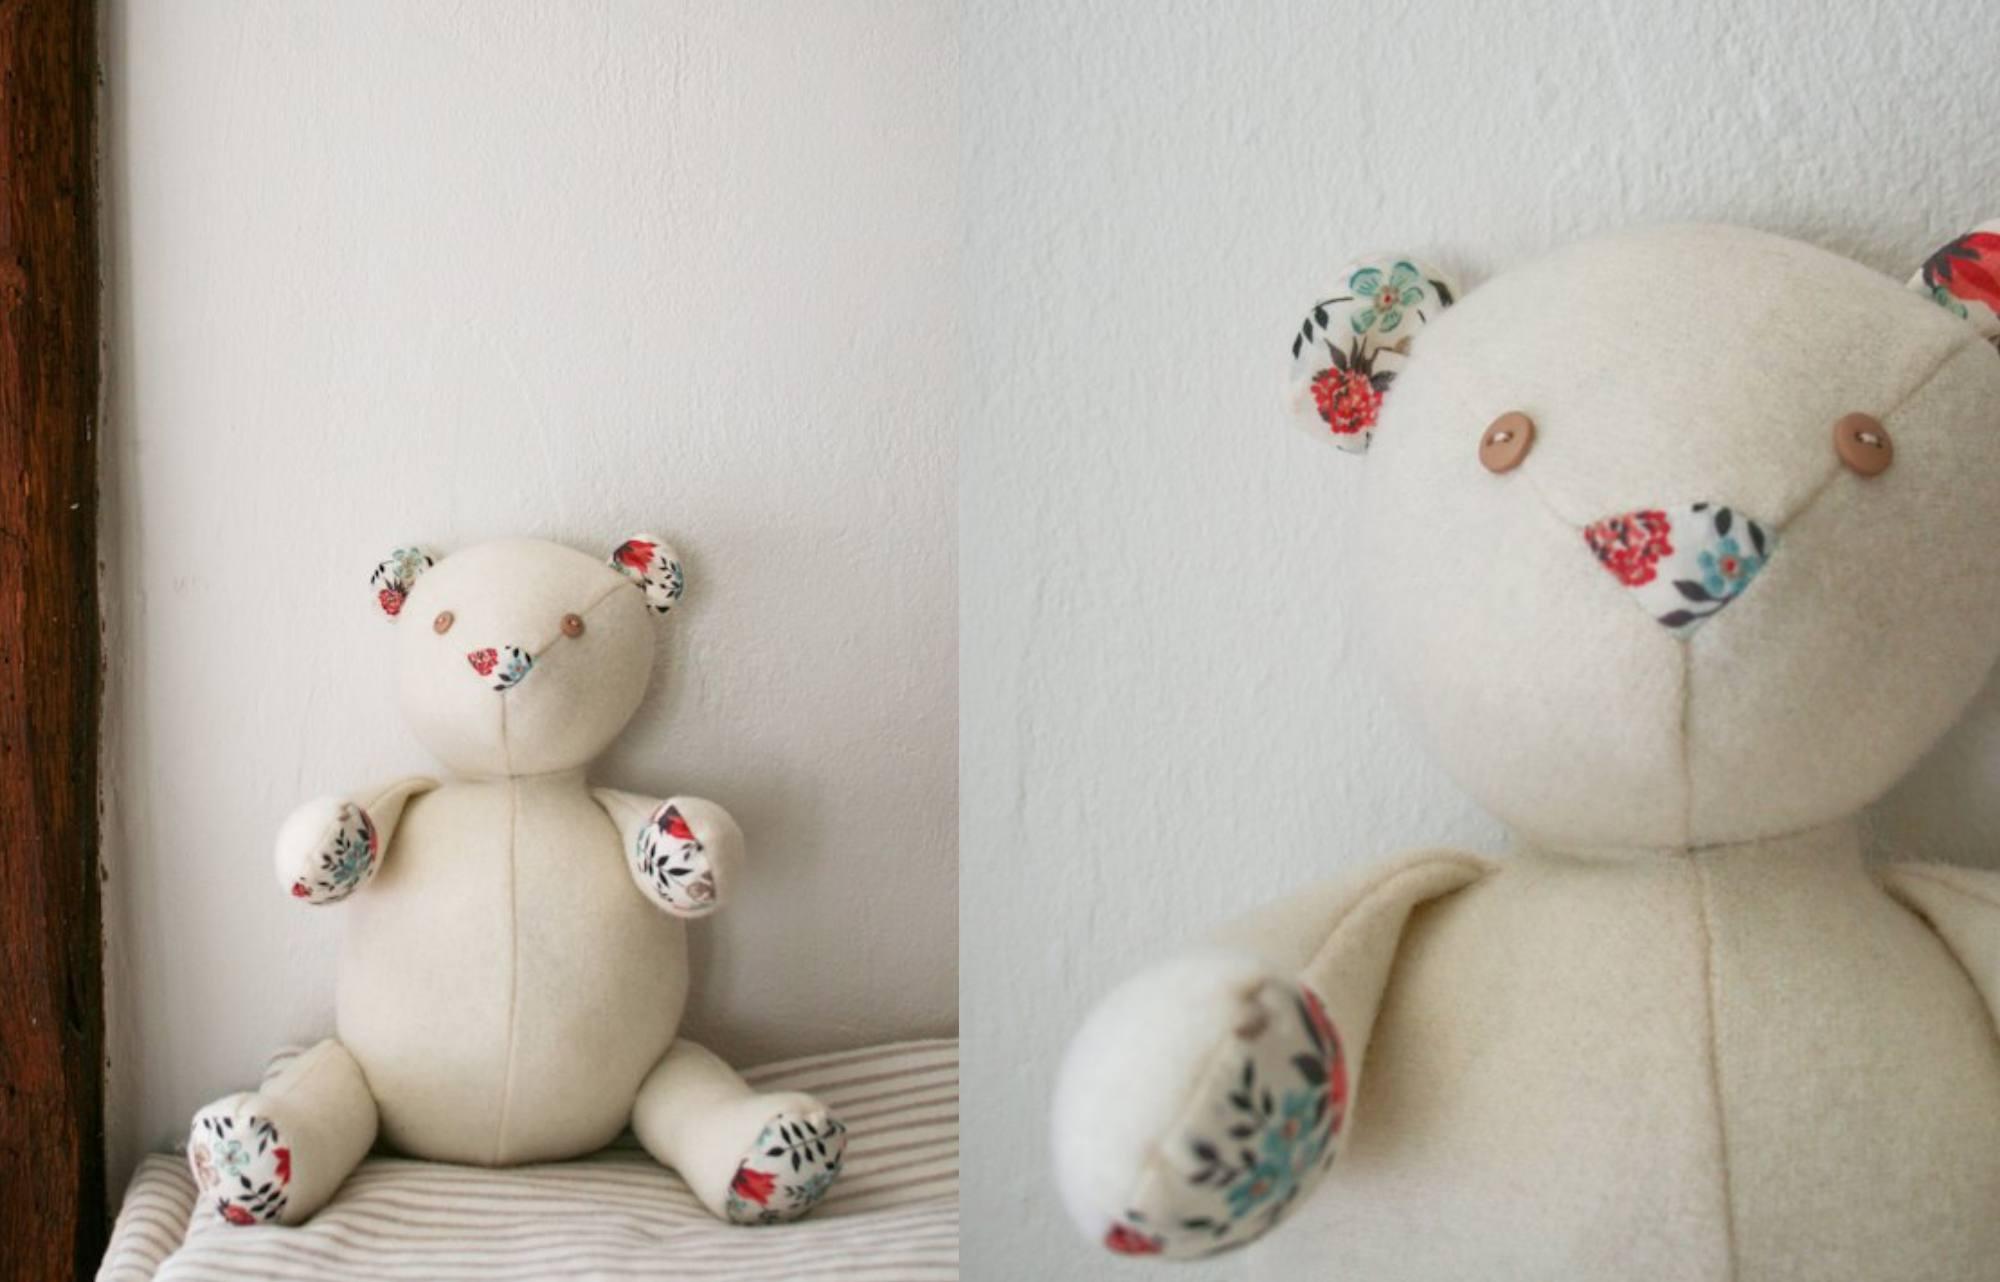 10 Adorable Teddy Bear Sewing Patterns - Free Teddy Bear Patterns Printable